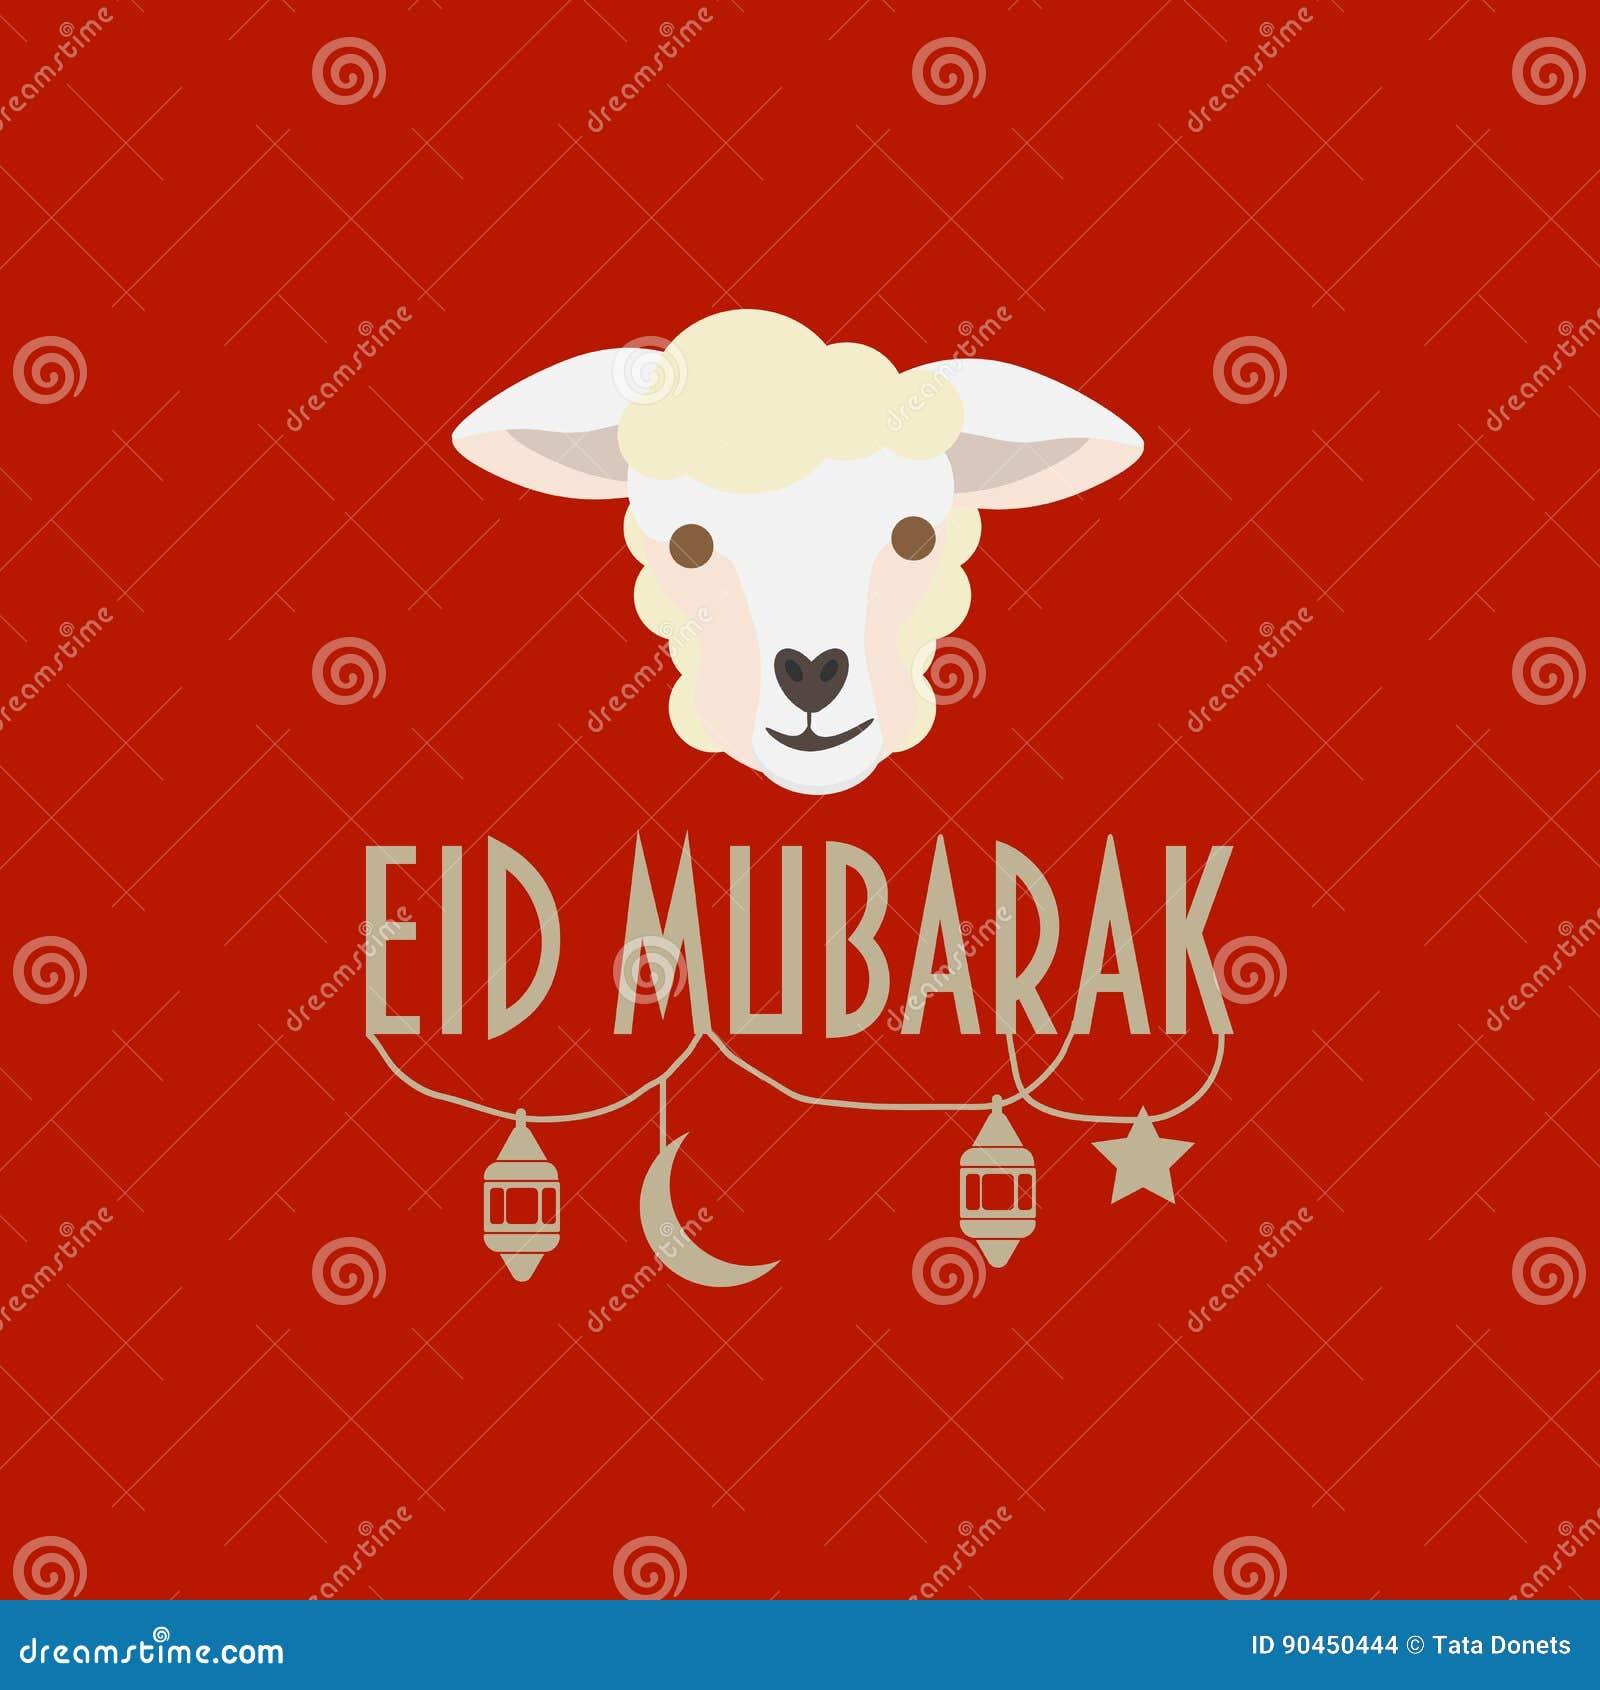 Eid Mubarak Greeting Card Eid Al Adha Festival Of The Sacrifice